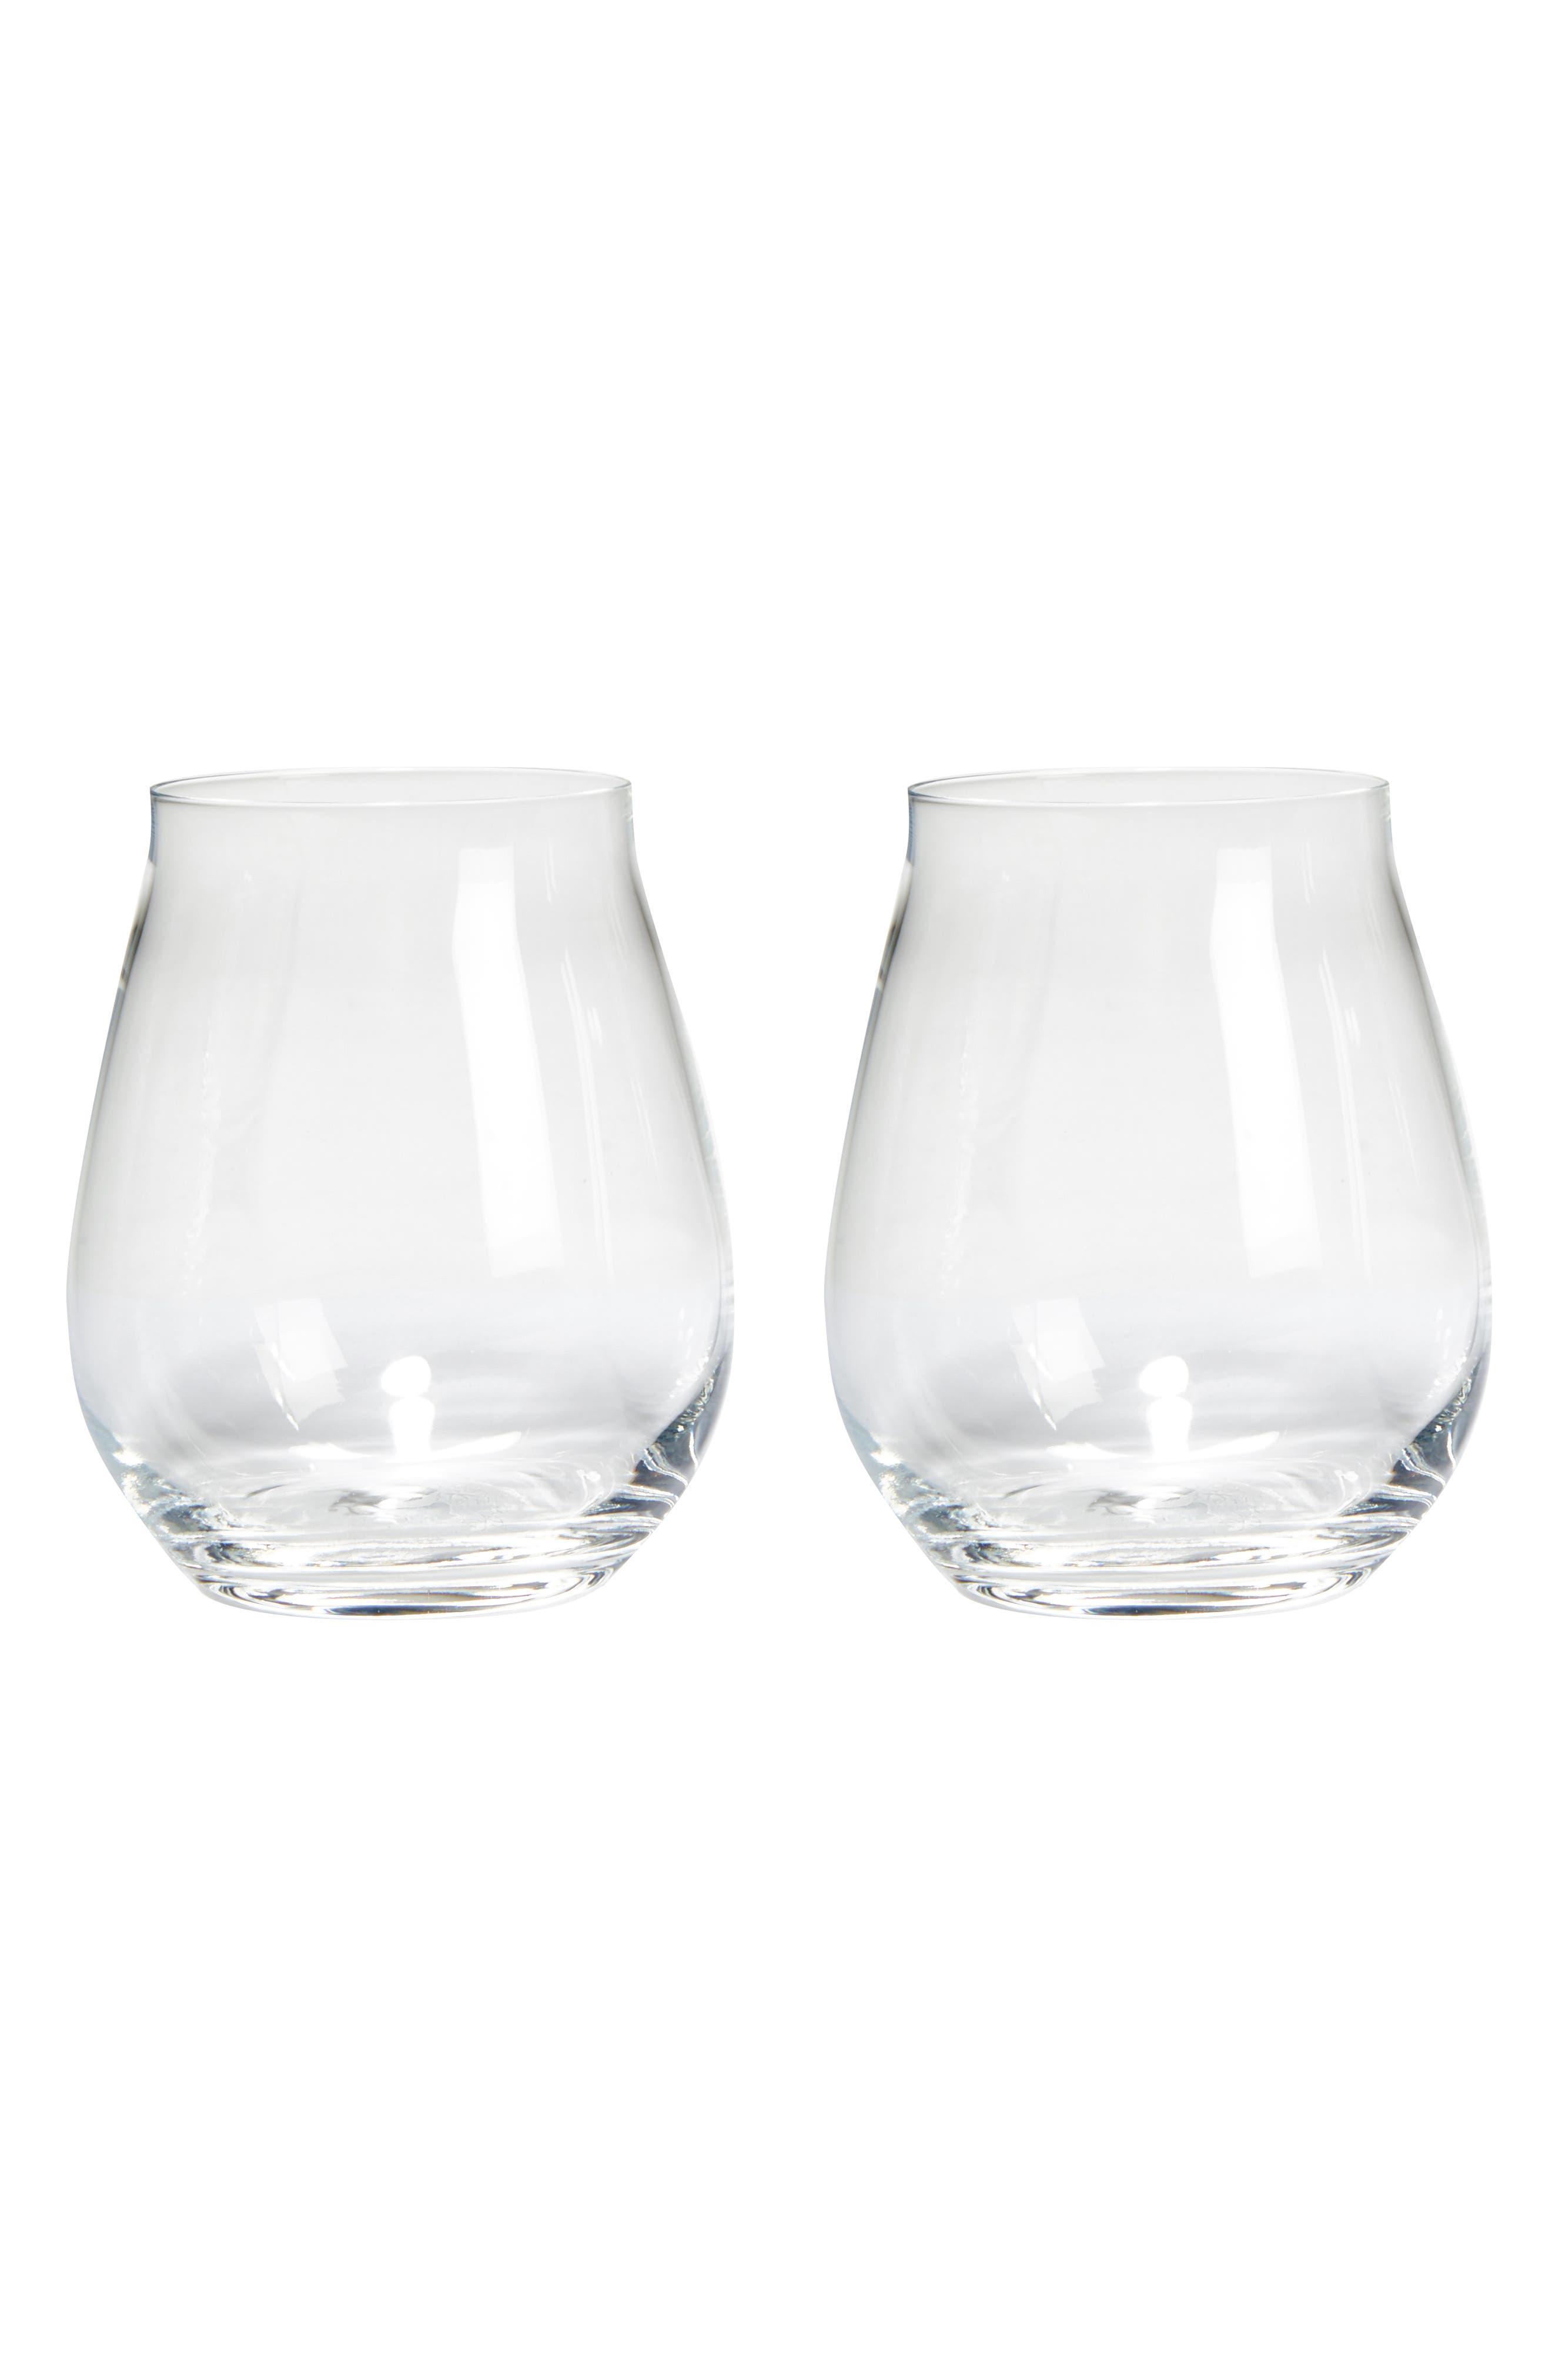 Alternate Image 1 Selected - Luigi Bormiolo Vinea Trebbiano Set of 2 Stemless Wine Glasses